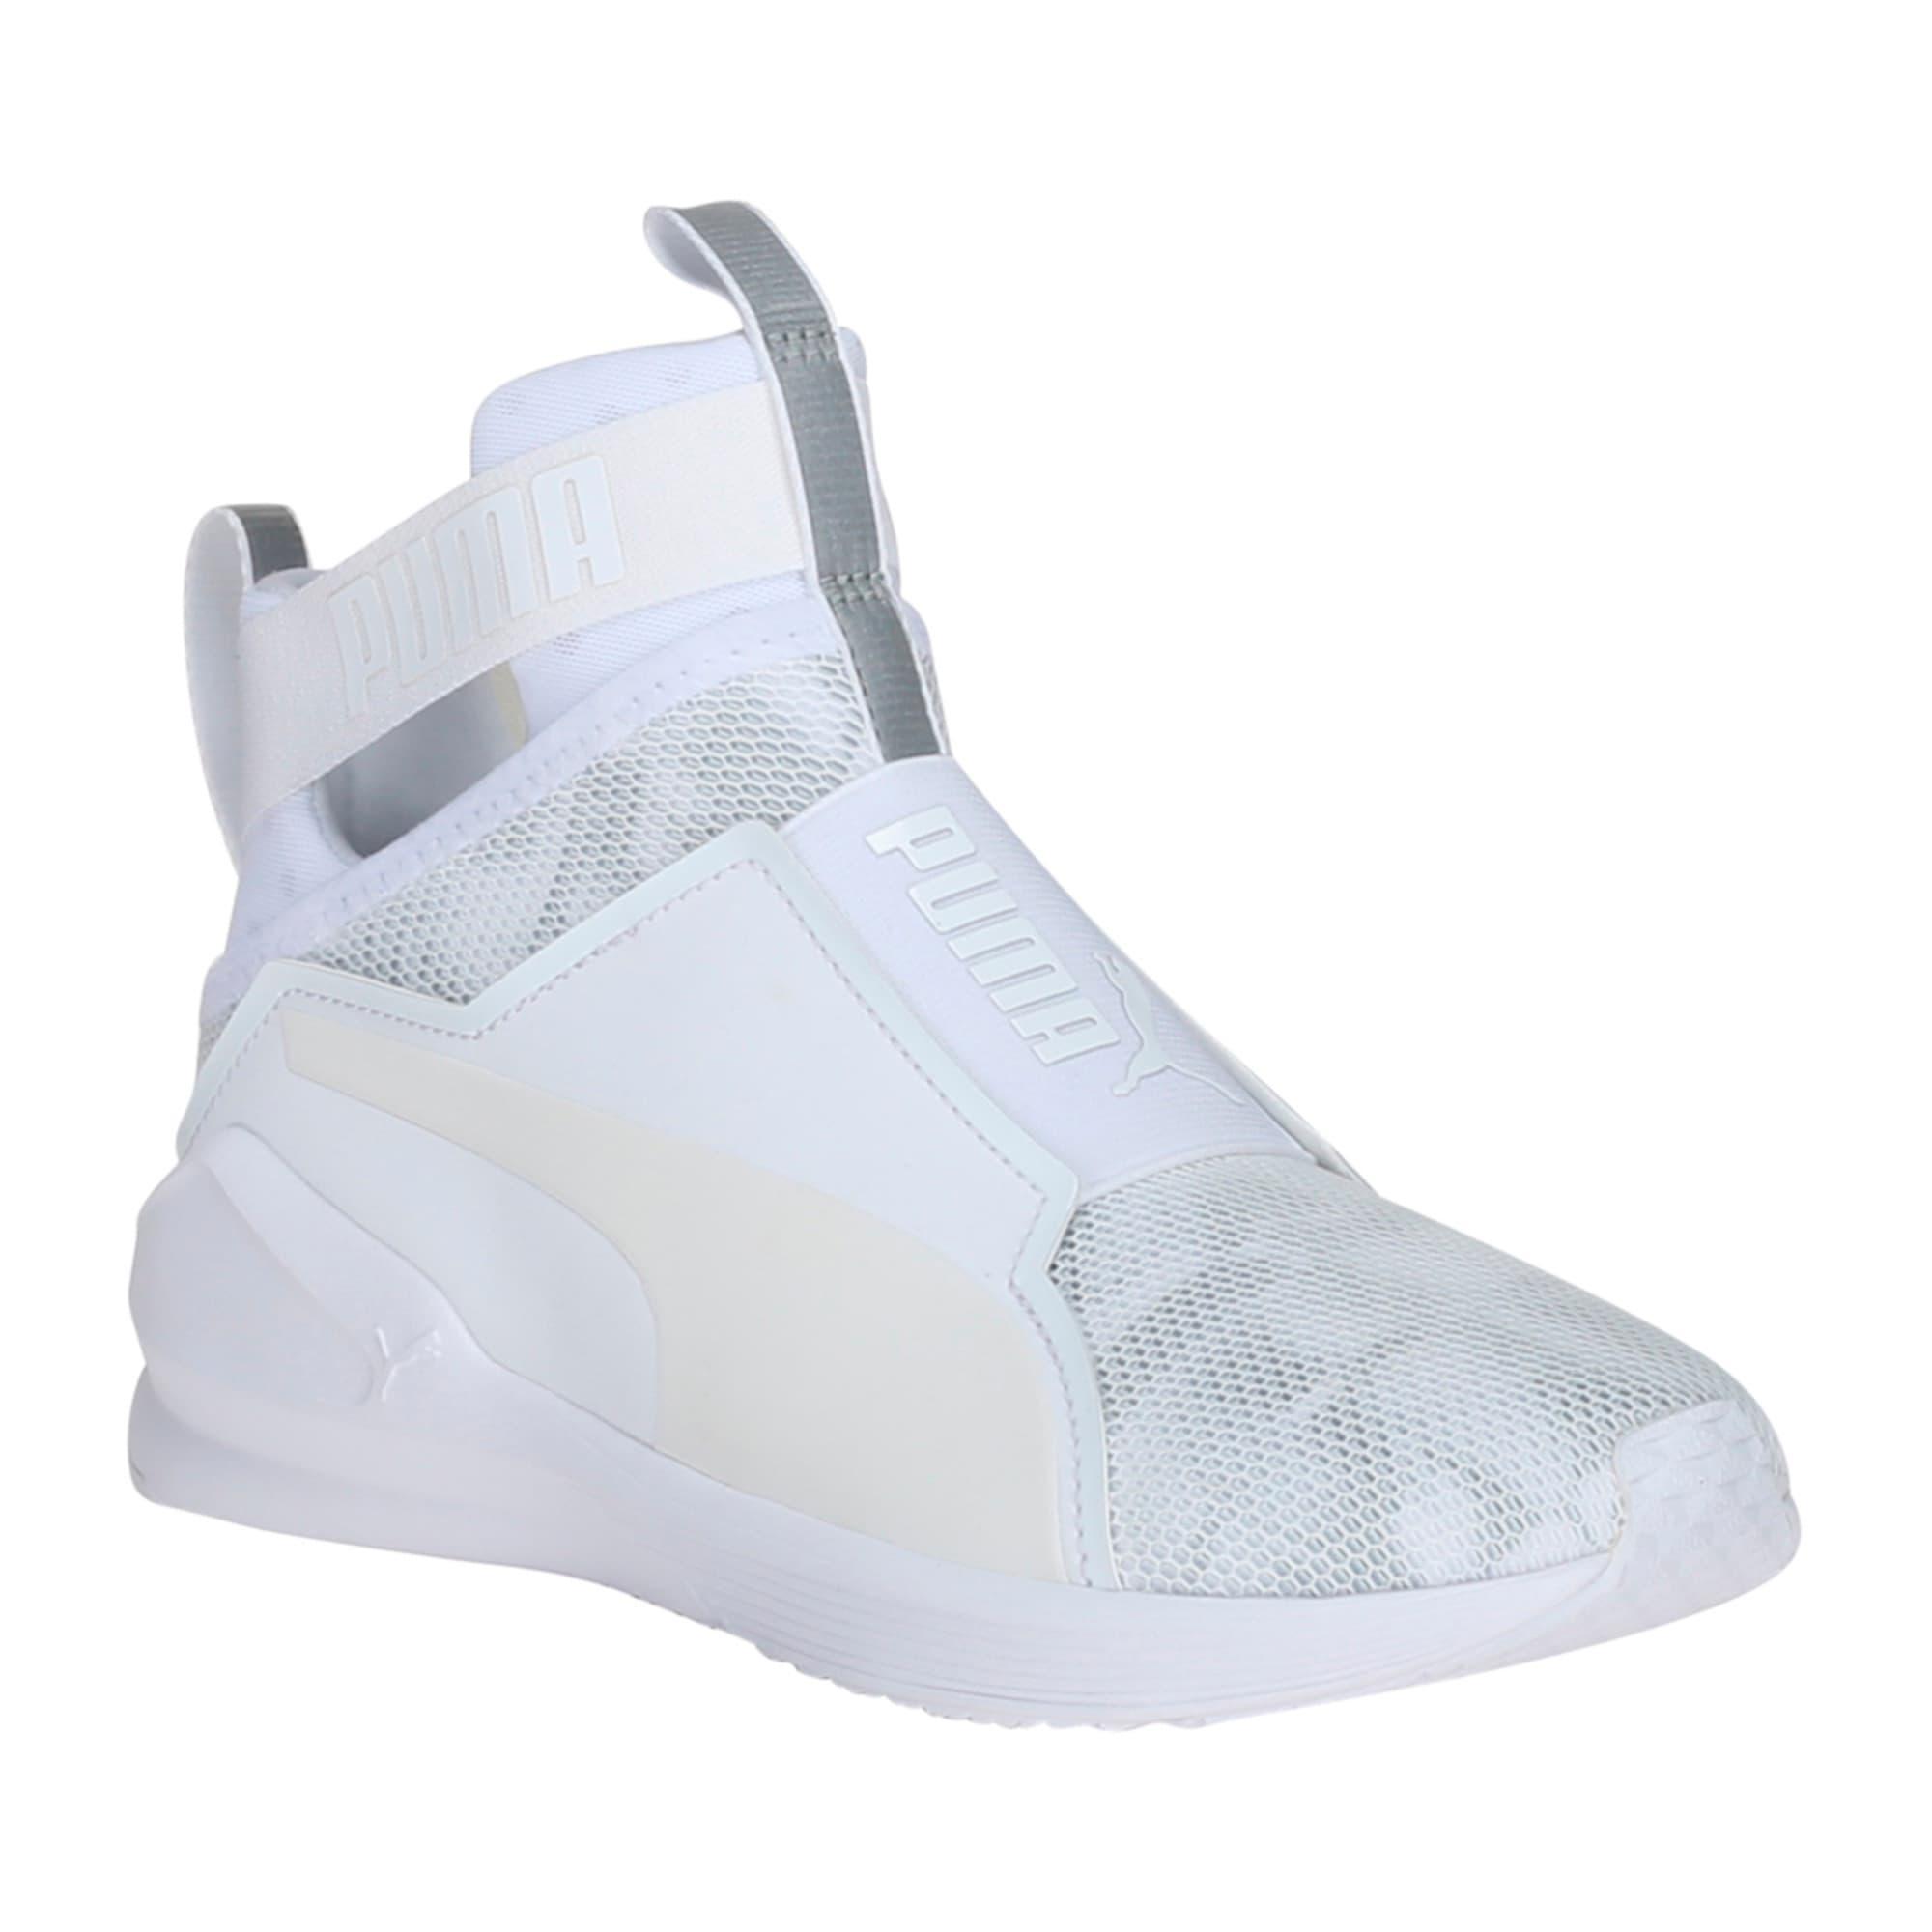 Thumbnail 4 of PUMA Fierce Swan Training Shoes, Puma White-Puma White, medium-IND